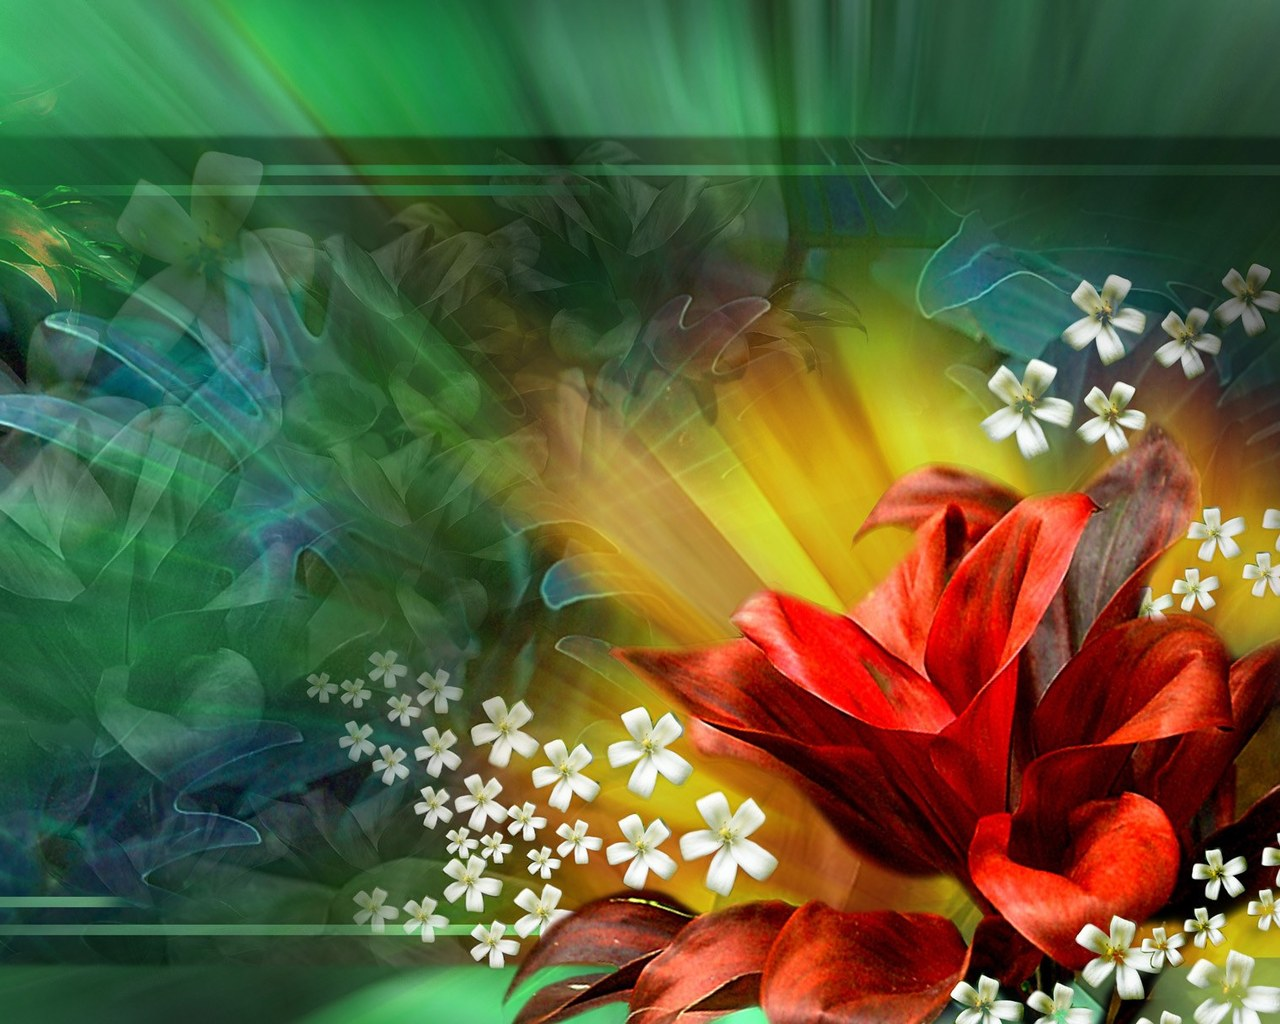 http://4.bp.blogspot.com/-zr6c5iCDk-A/TlDcIviHuzI/AAAAAAAADhM/ubA7WK0reM0/s1600/free+download+3d+wallpaper-1.jpg